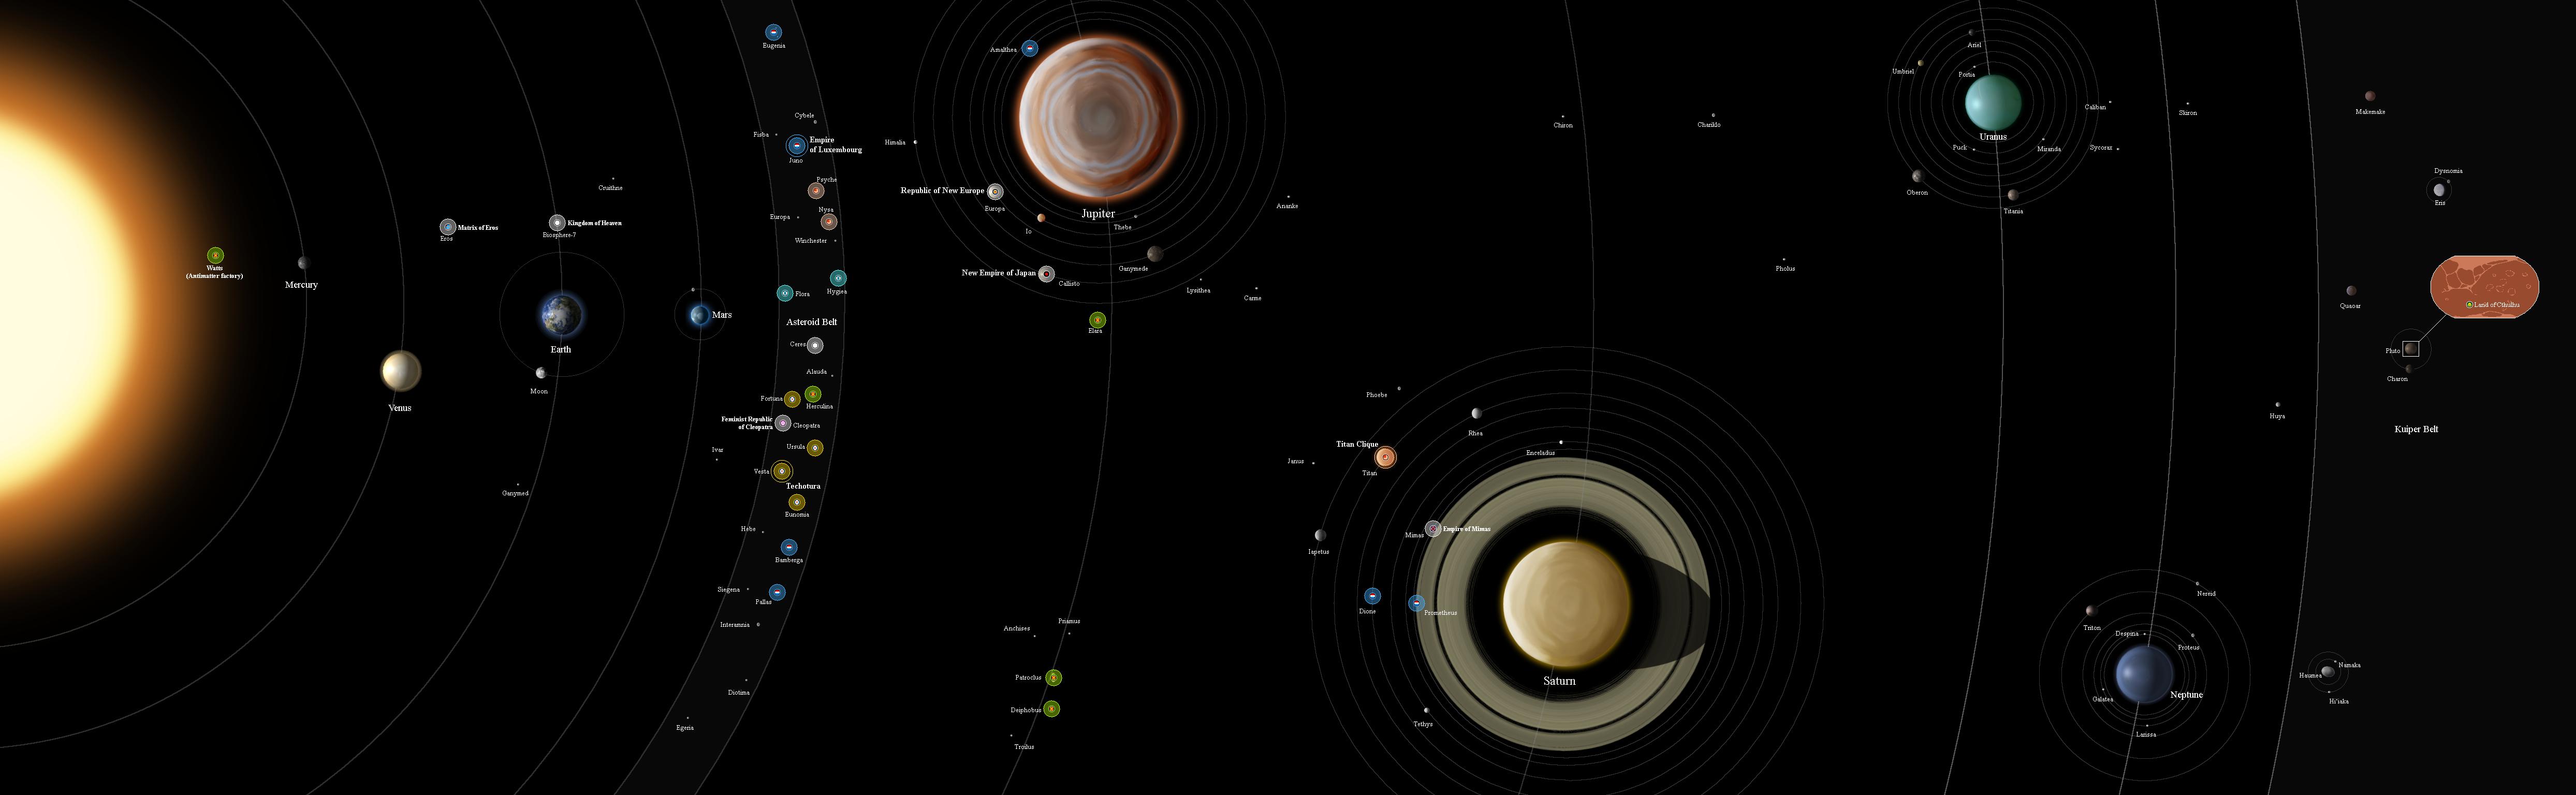 sol_system_2222_png_by_sera_fim-dc0r5id.